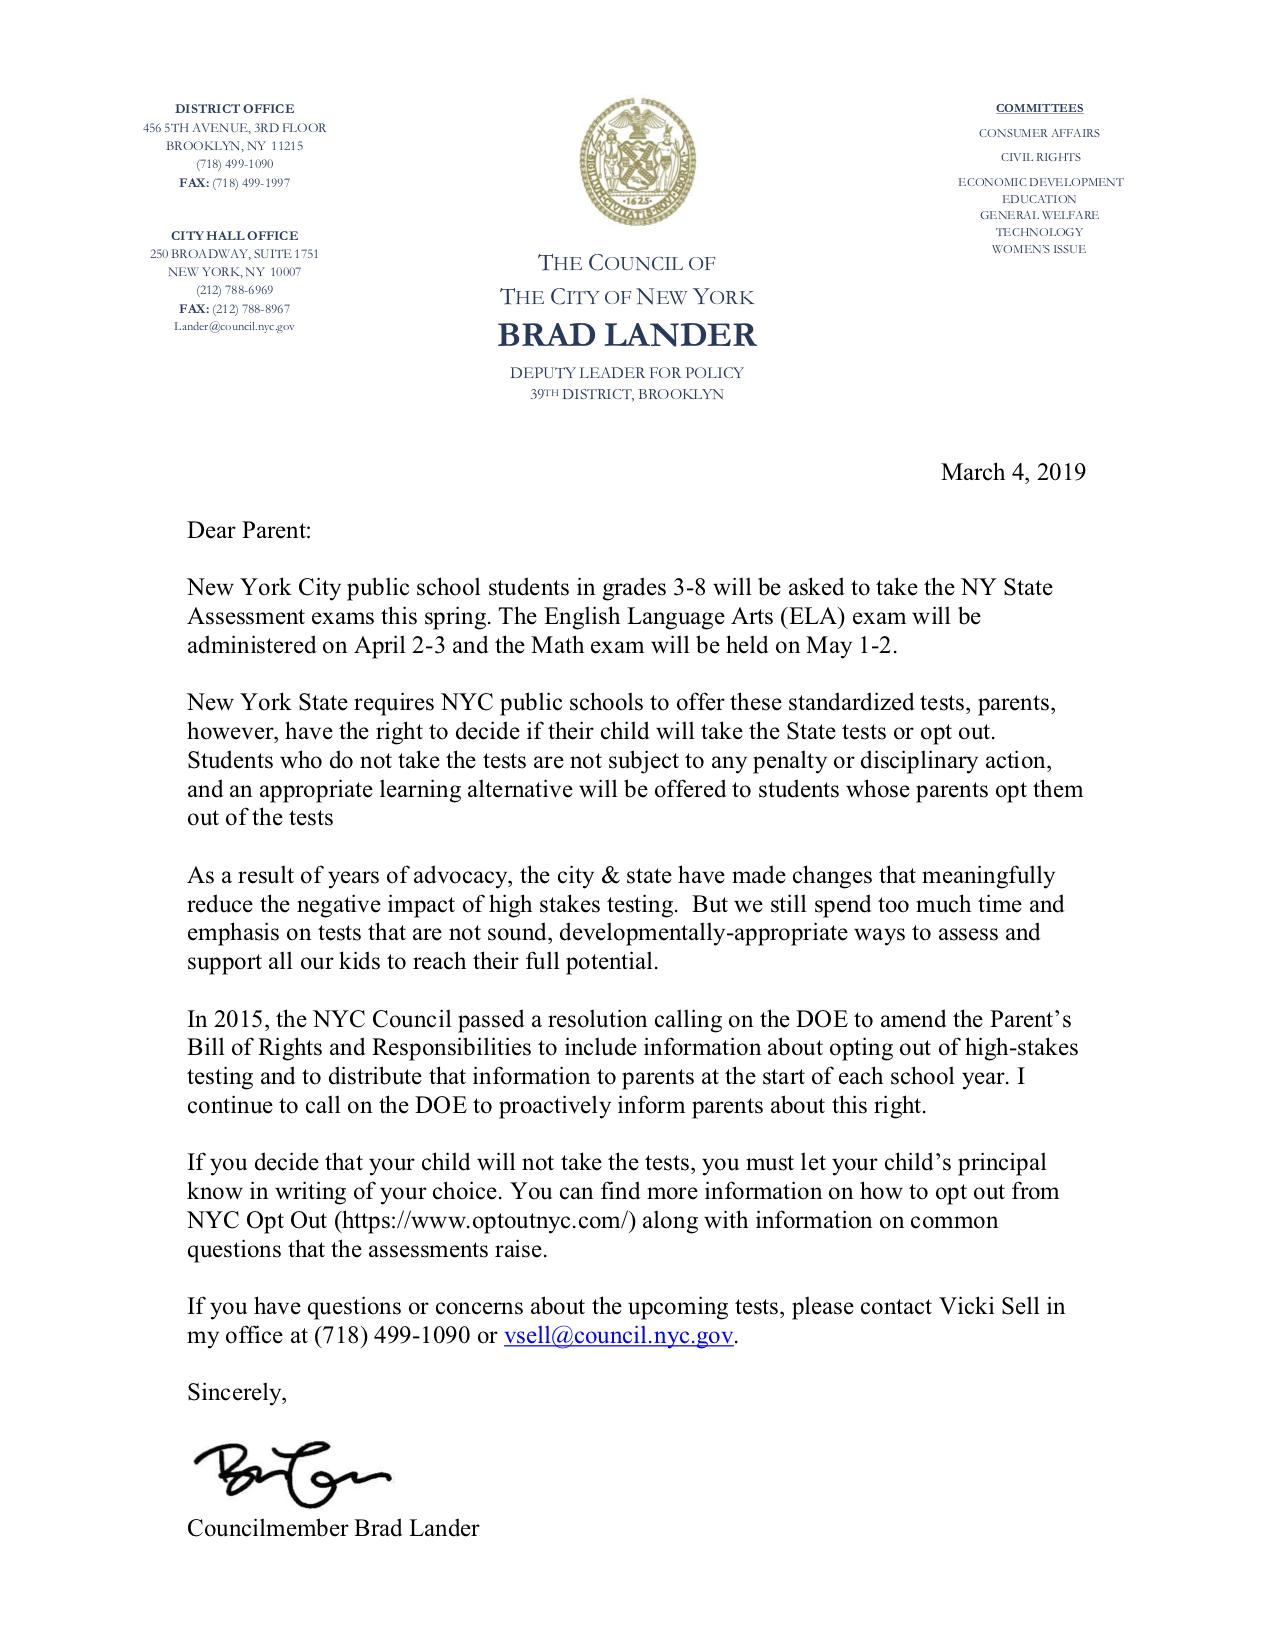 2019 Lander - Letter regarding opt out right.png